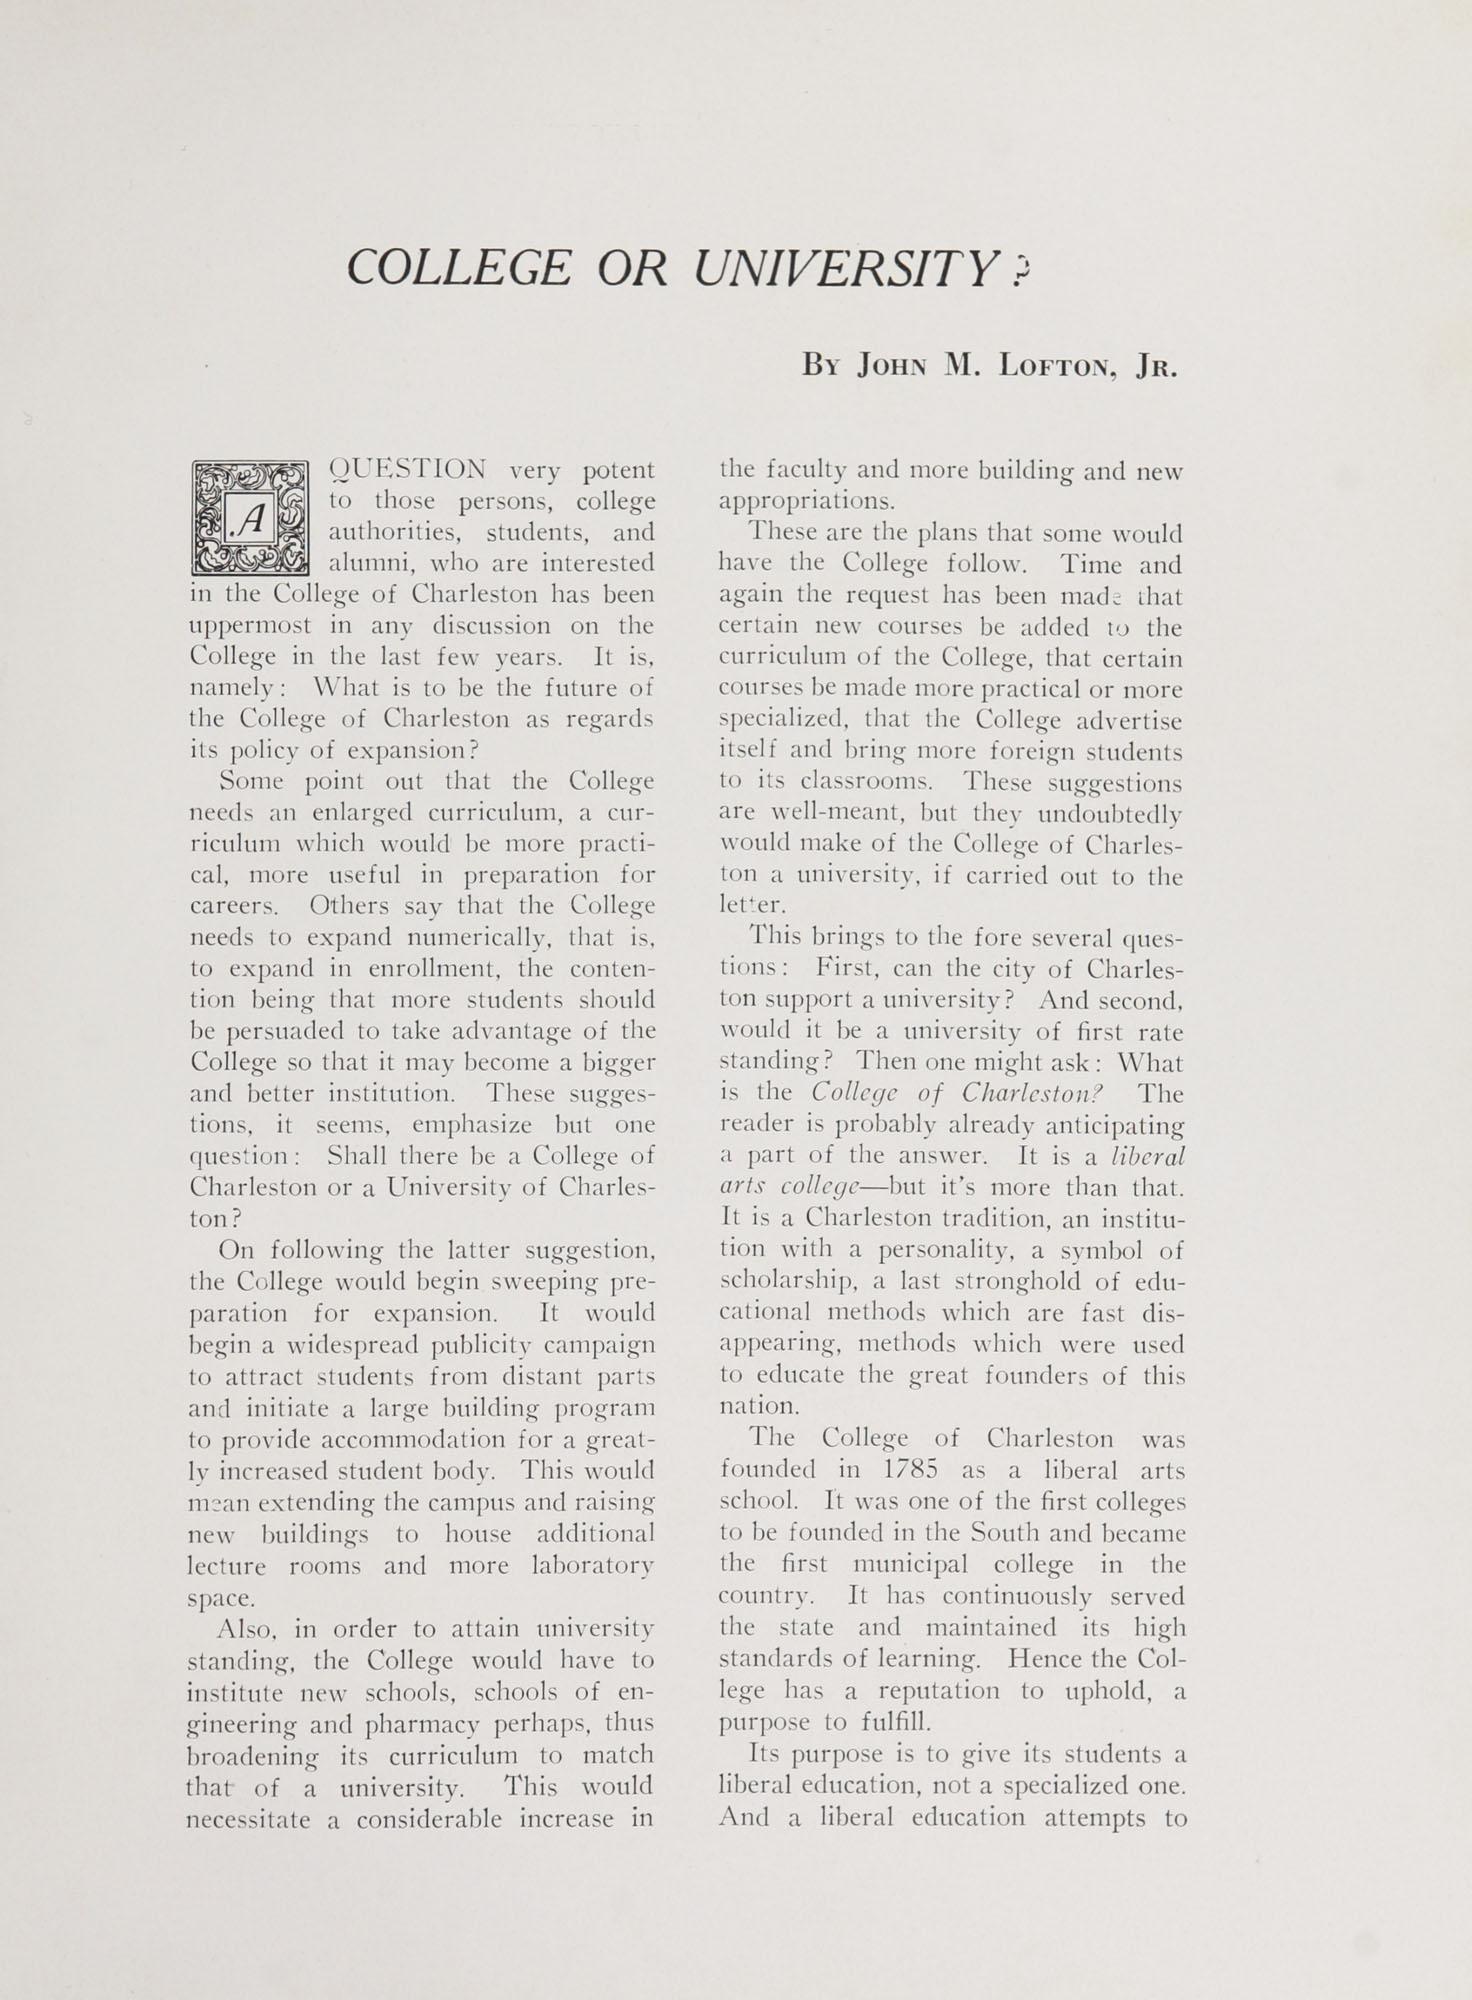 College of Charleston Magazine, 1938-1939, Vol. XXXXII No. 1, page 5